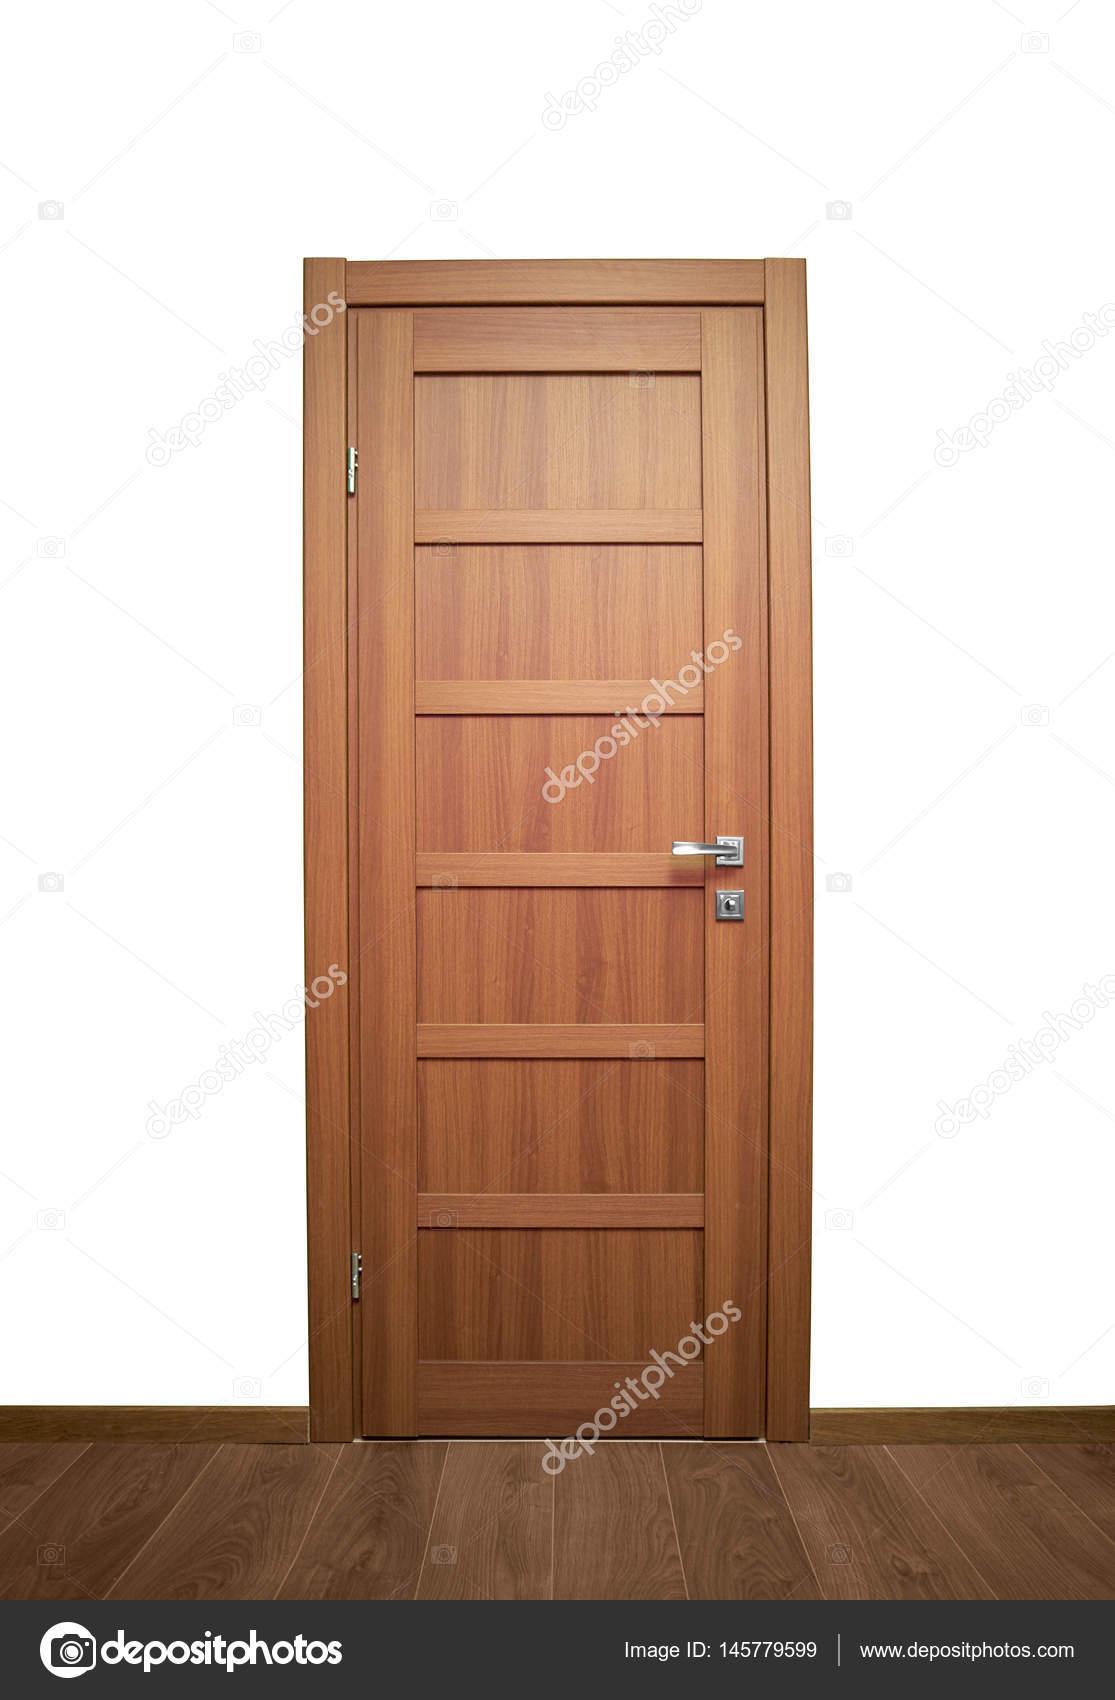 puertas interiores de madera — Fotos de Stock © Himchenko #145779599